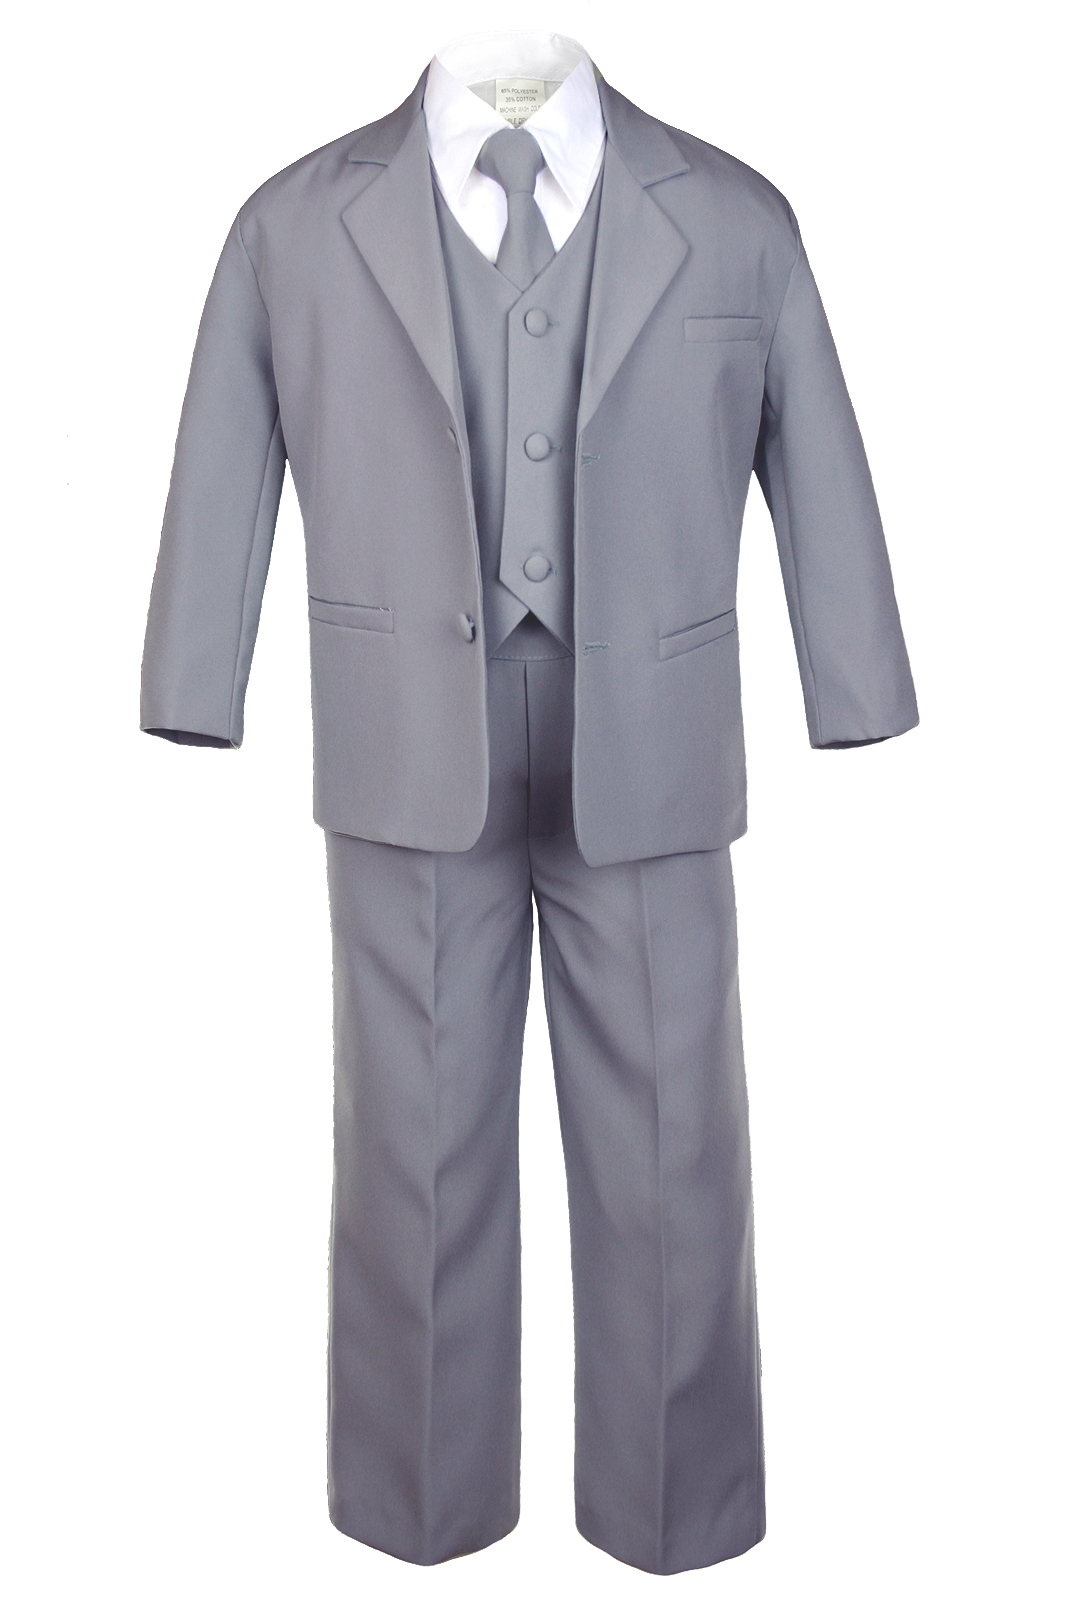 5pc New Born Boy Kid Teen Wedding Dark Gray Blazer Formal Tuxedo Suit Set S-20